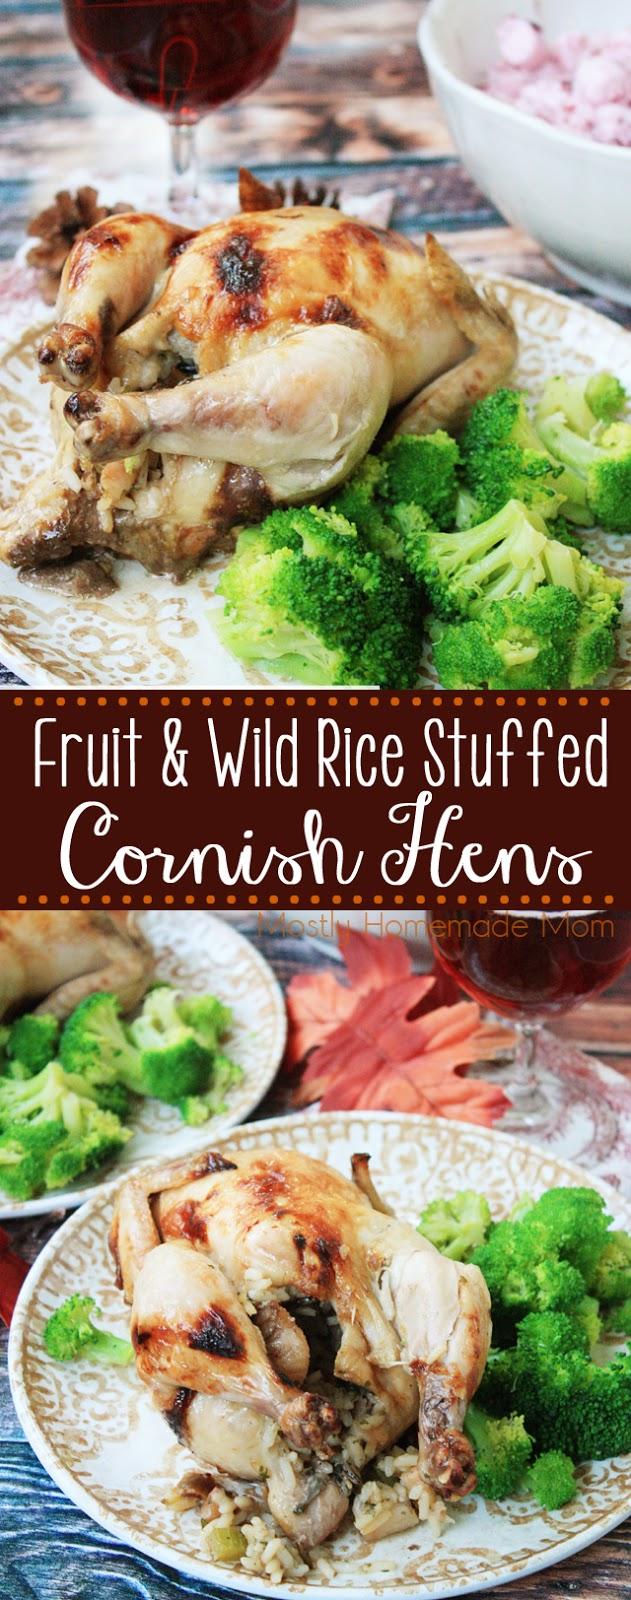 Fruit and Wild Rice Stuffed Cornish Hens Recipe